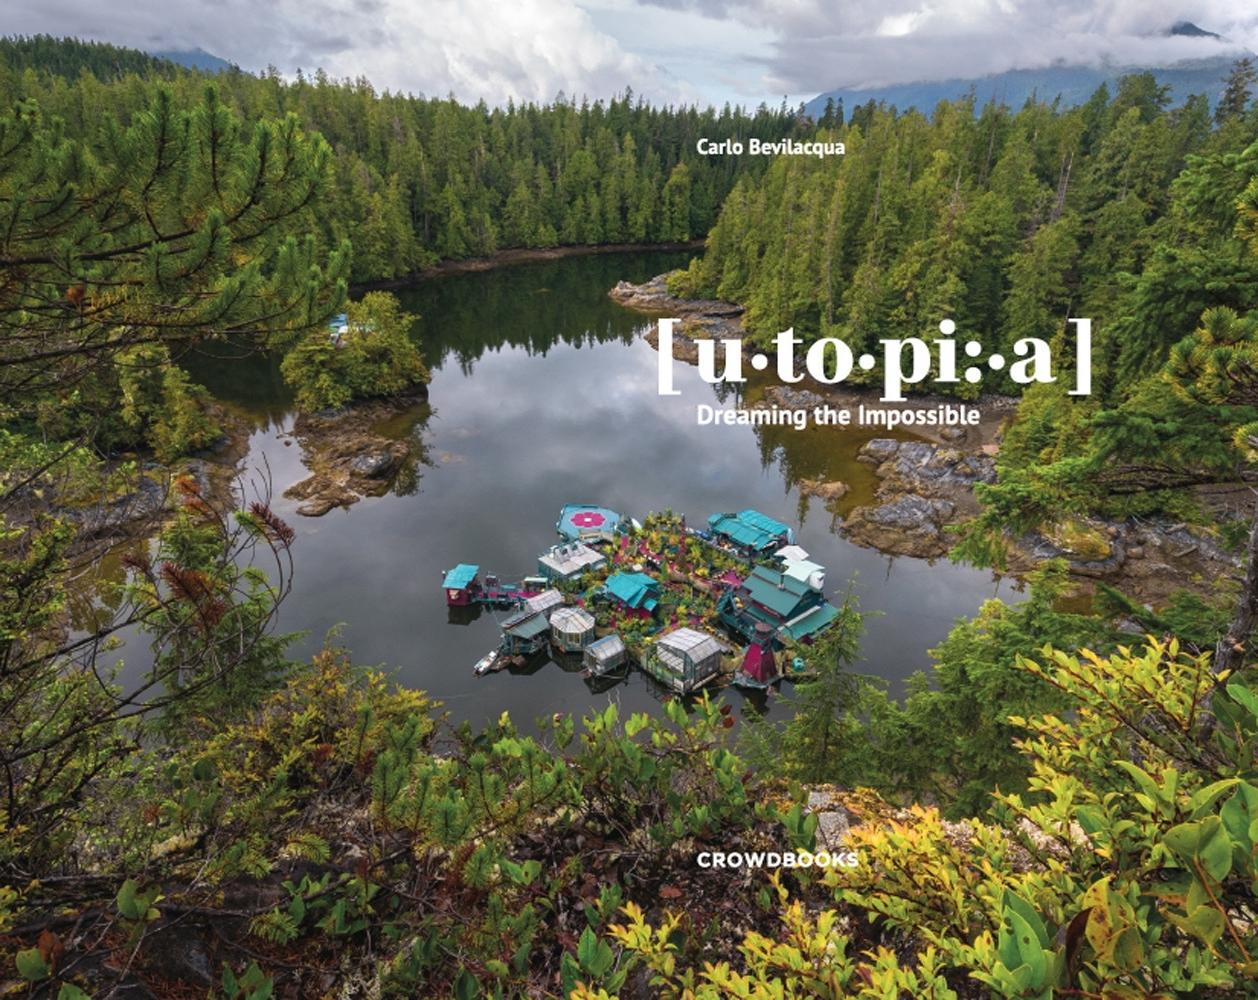 Utopia, dreaming the impossible. Ediz. illustrata